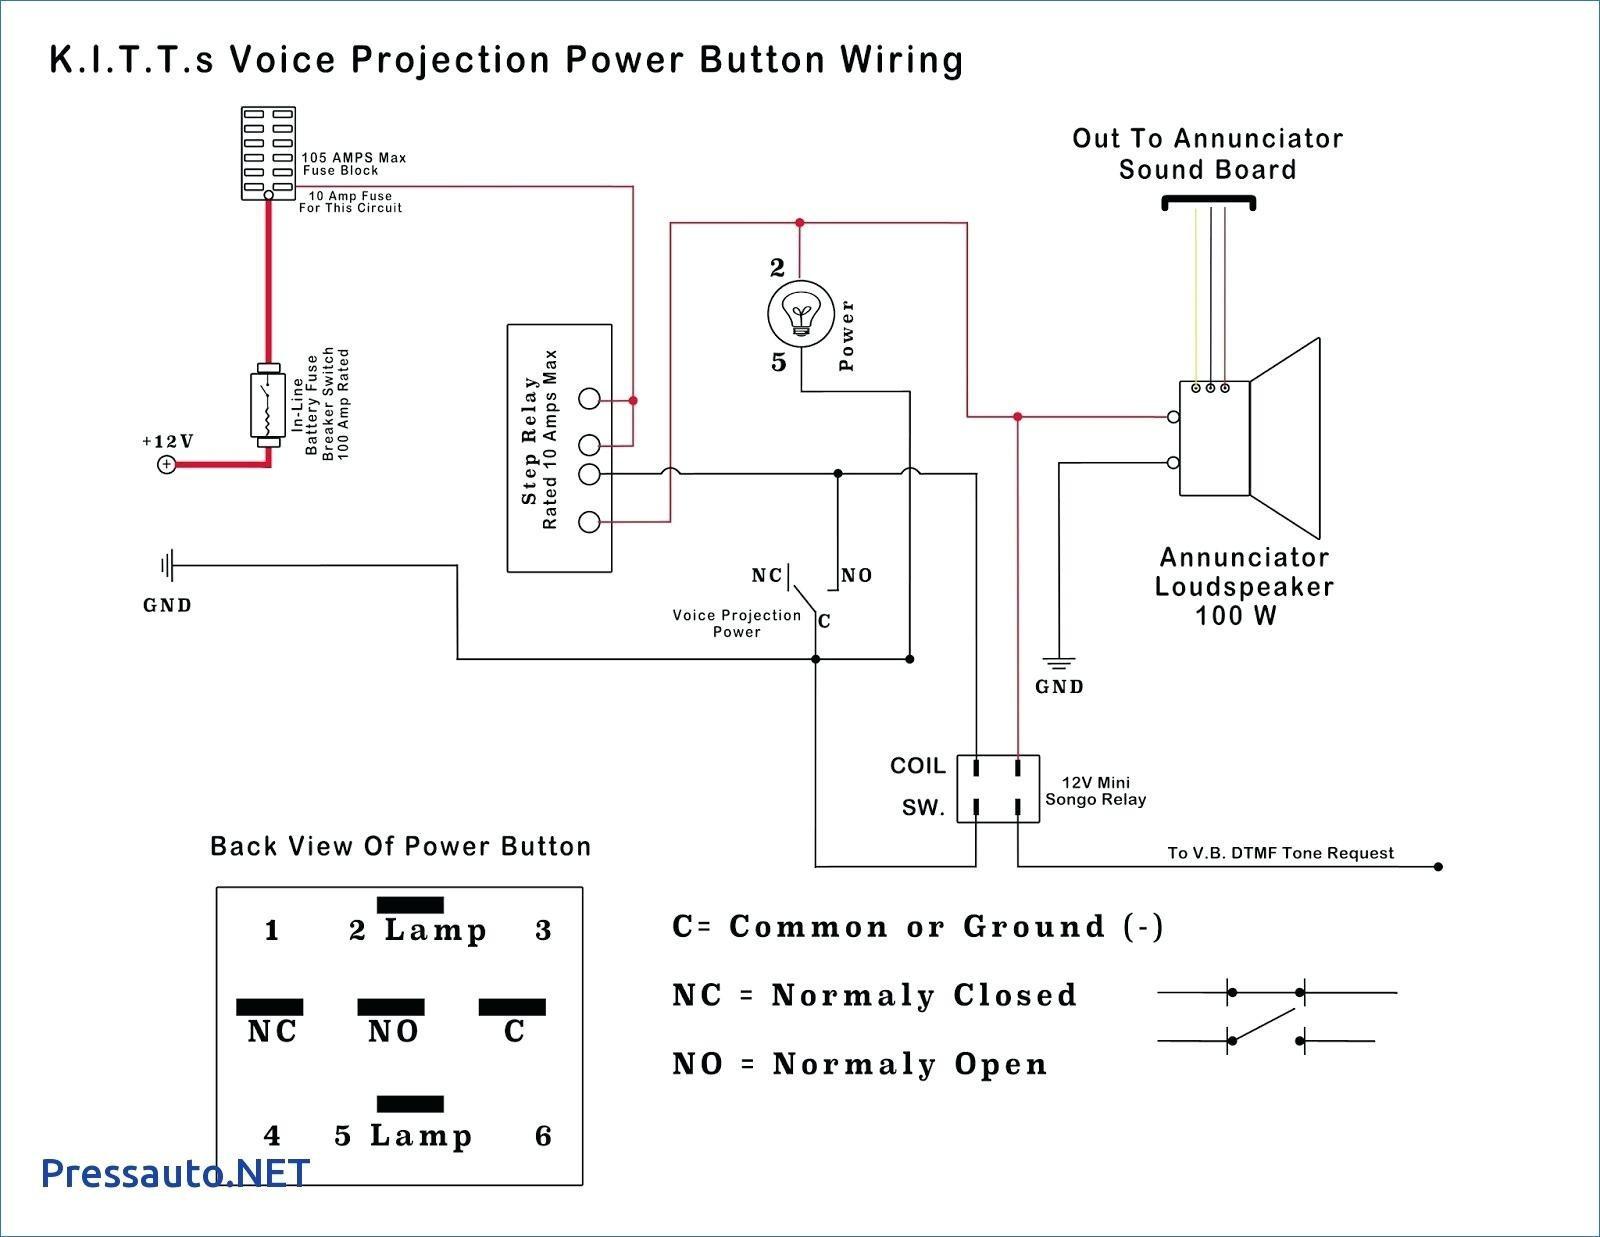 Glow Plug Wiring 6 9 - Wiring Diagram Data Oreo - 7.3 Idi Glow Plug Controller Wiring Diagram